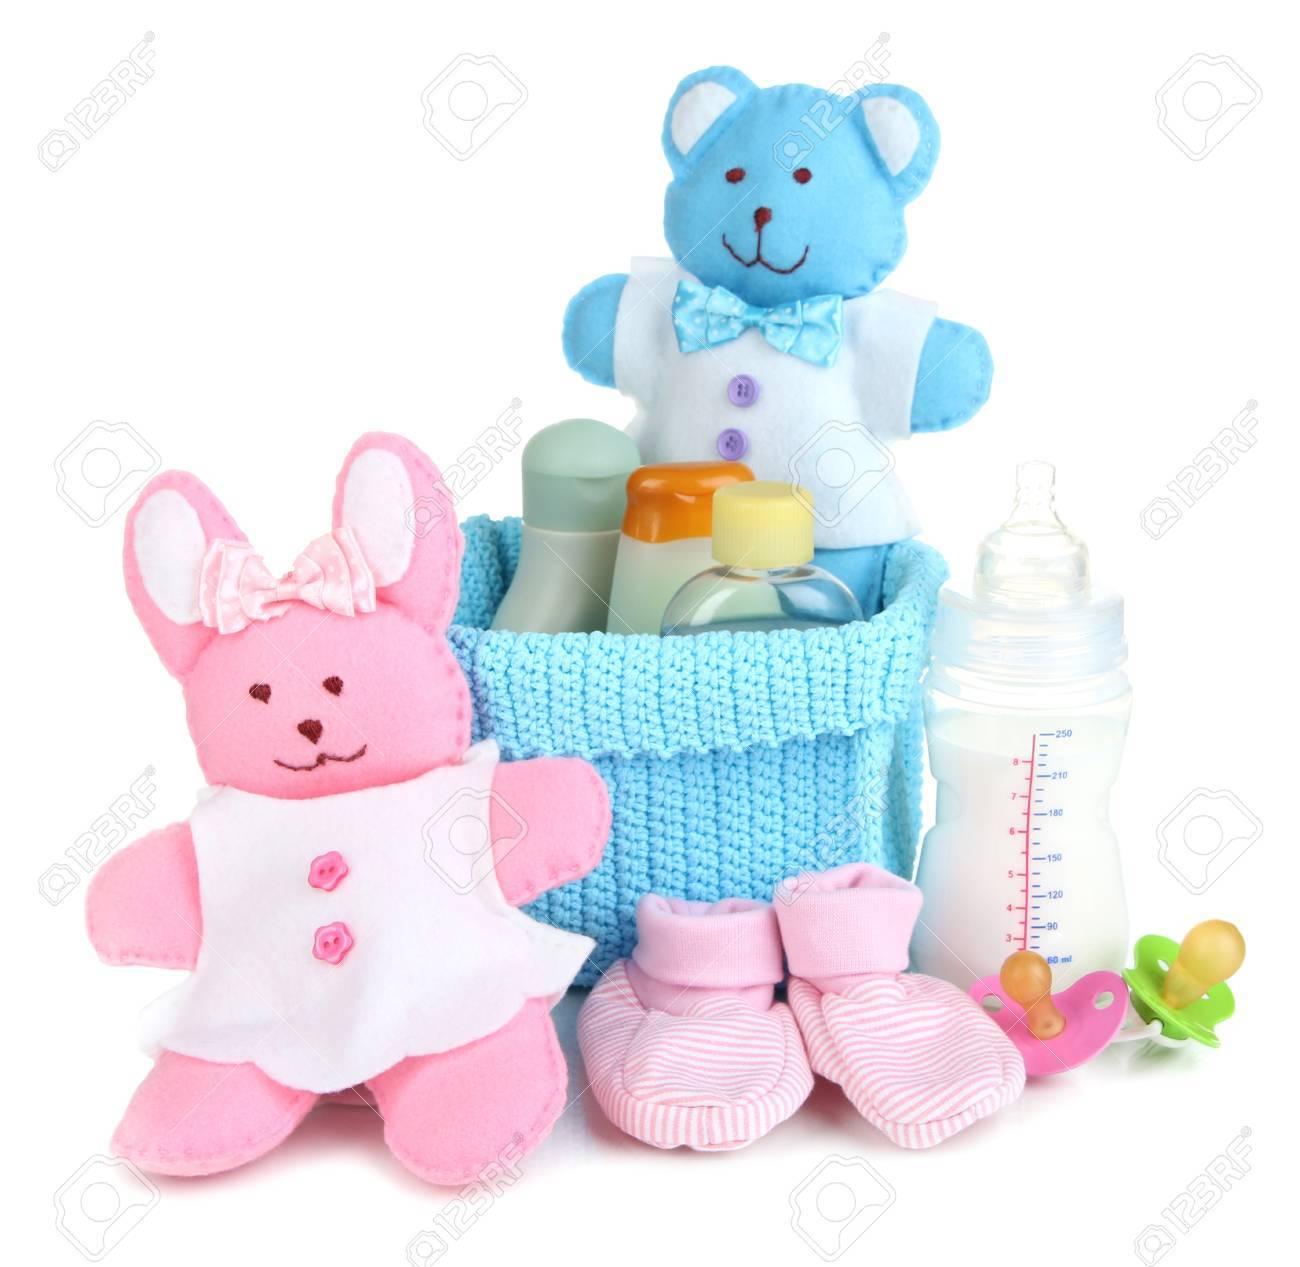 a2ea84711e5 Baby Accessoires Geïsoleerd Op Wit Royalty-Vrije Foto, Plaatjes ...